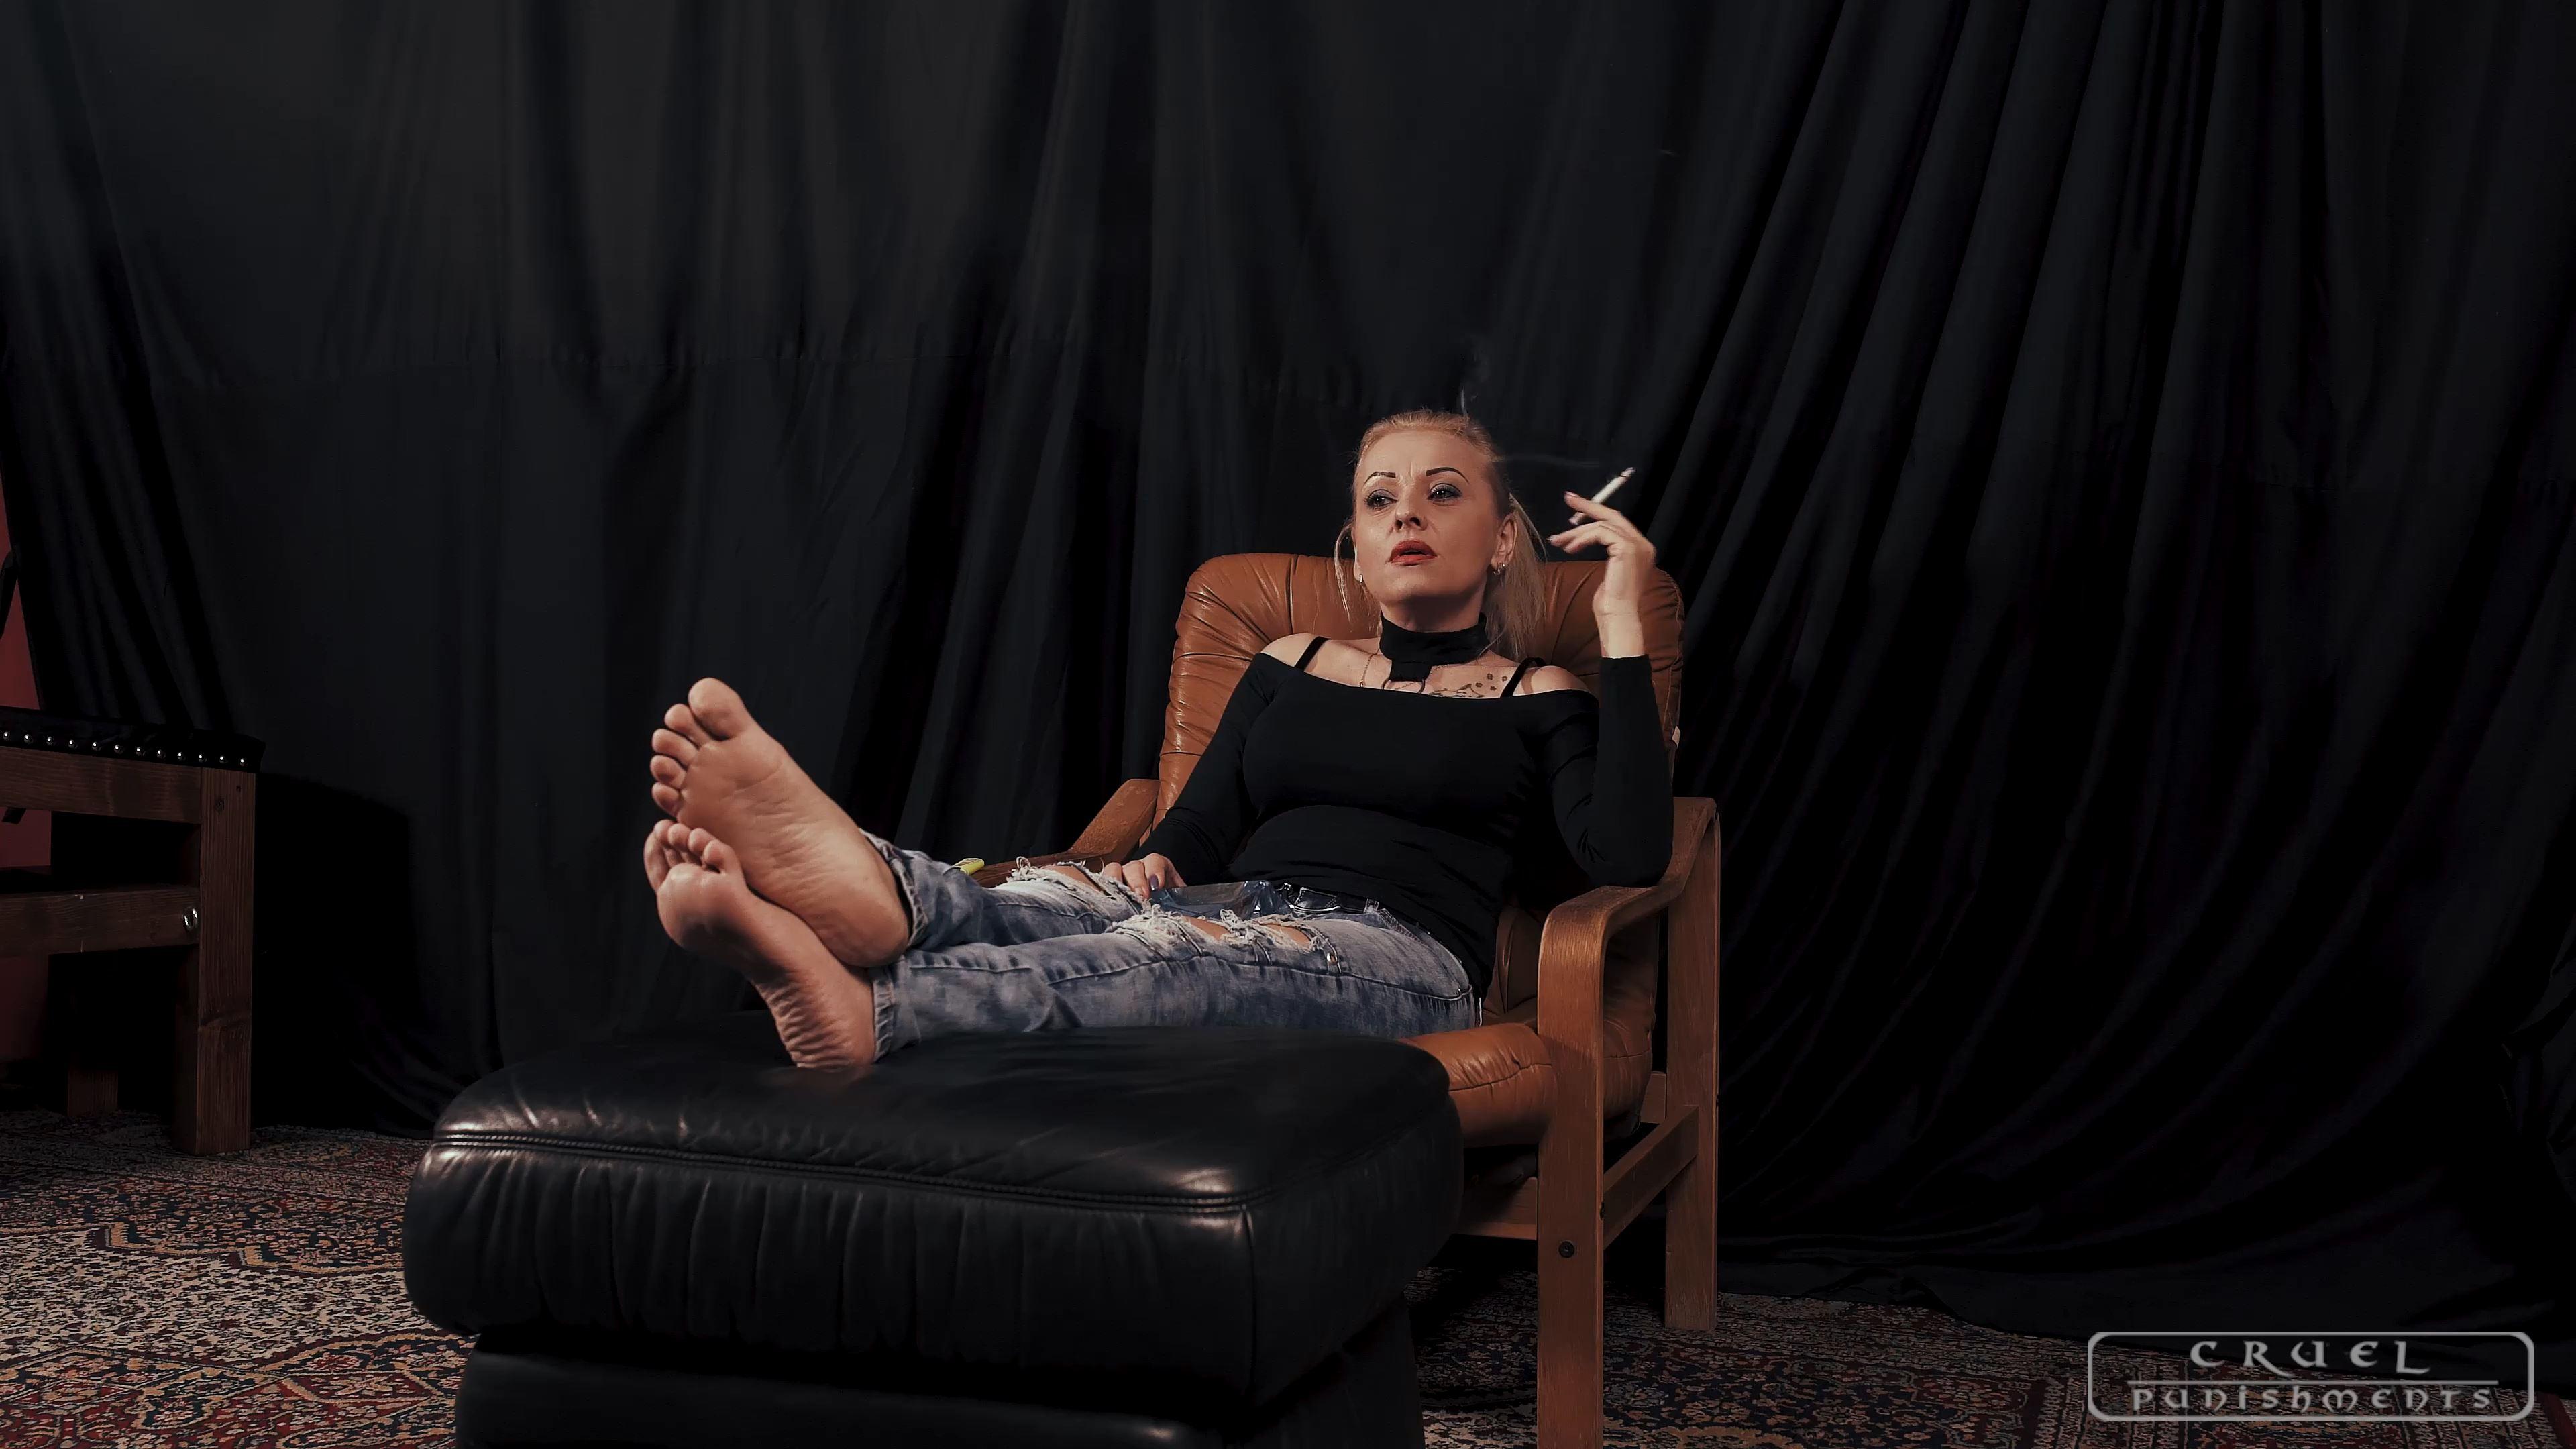 Lady Gwen In Scene: A nice cigarette - CRUEL PUNISHMENTS - SEVERE FEMDOM - FULL HD/2160p/MP4